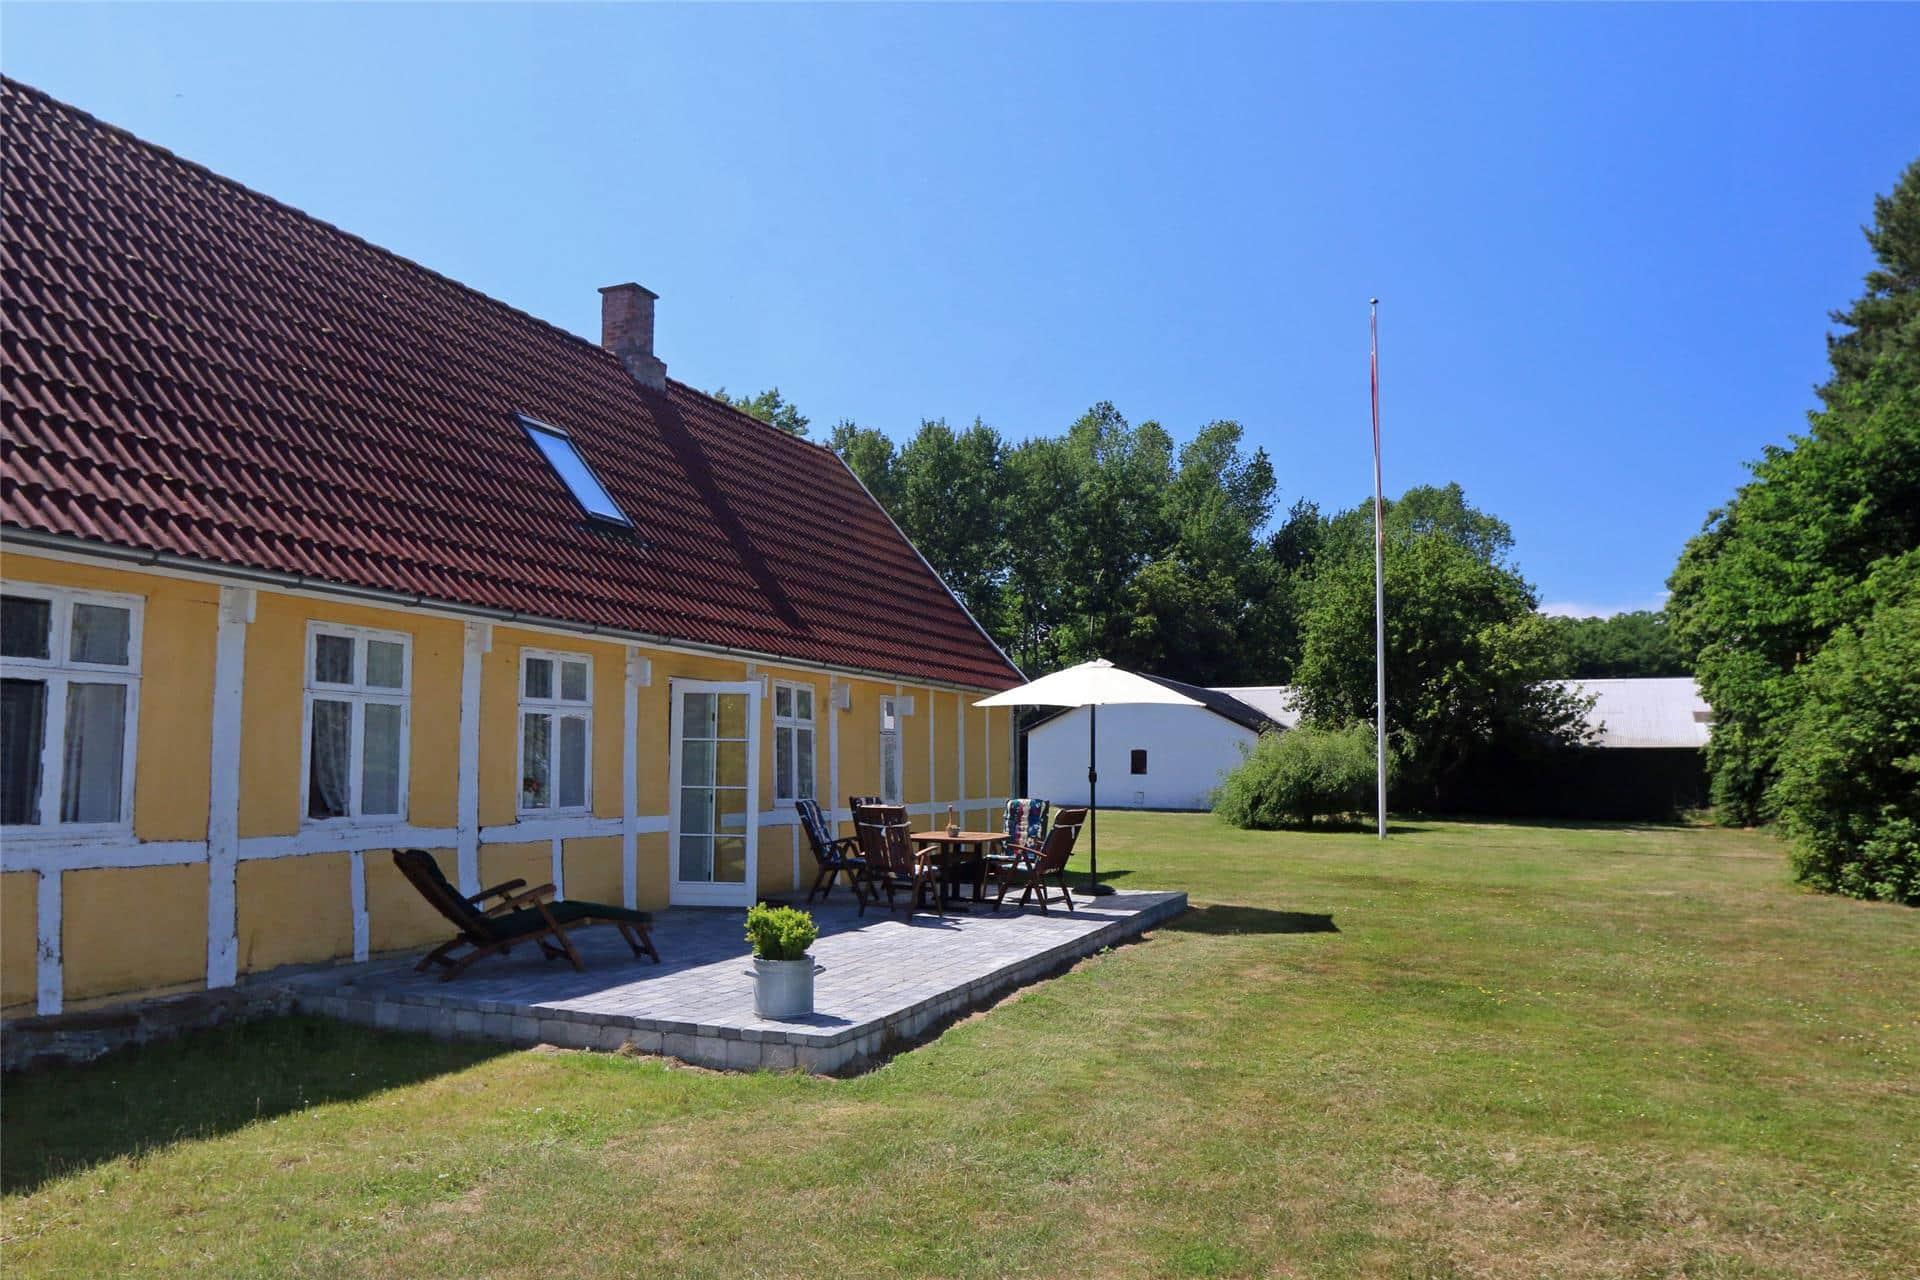 Bild 1-10 Ferienhaus 4700, Søndre Landevej 180, DK - 3720 Aakirkeby